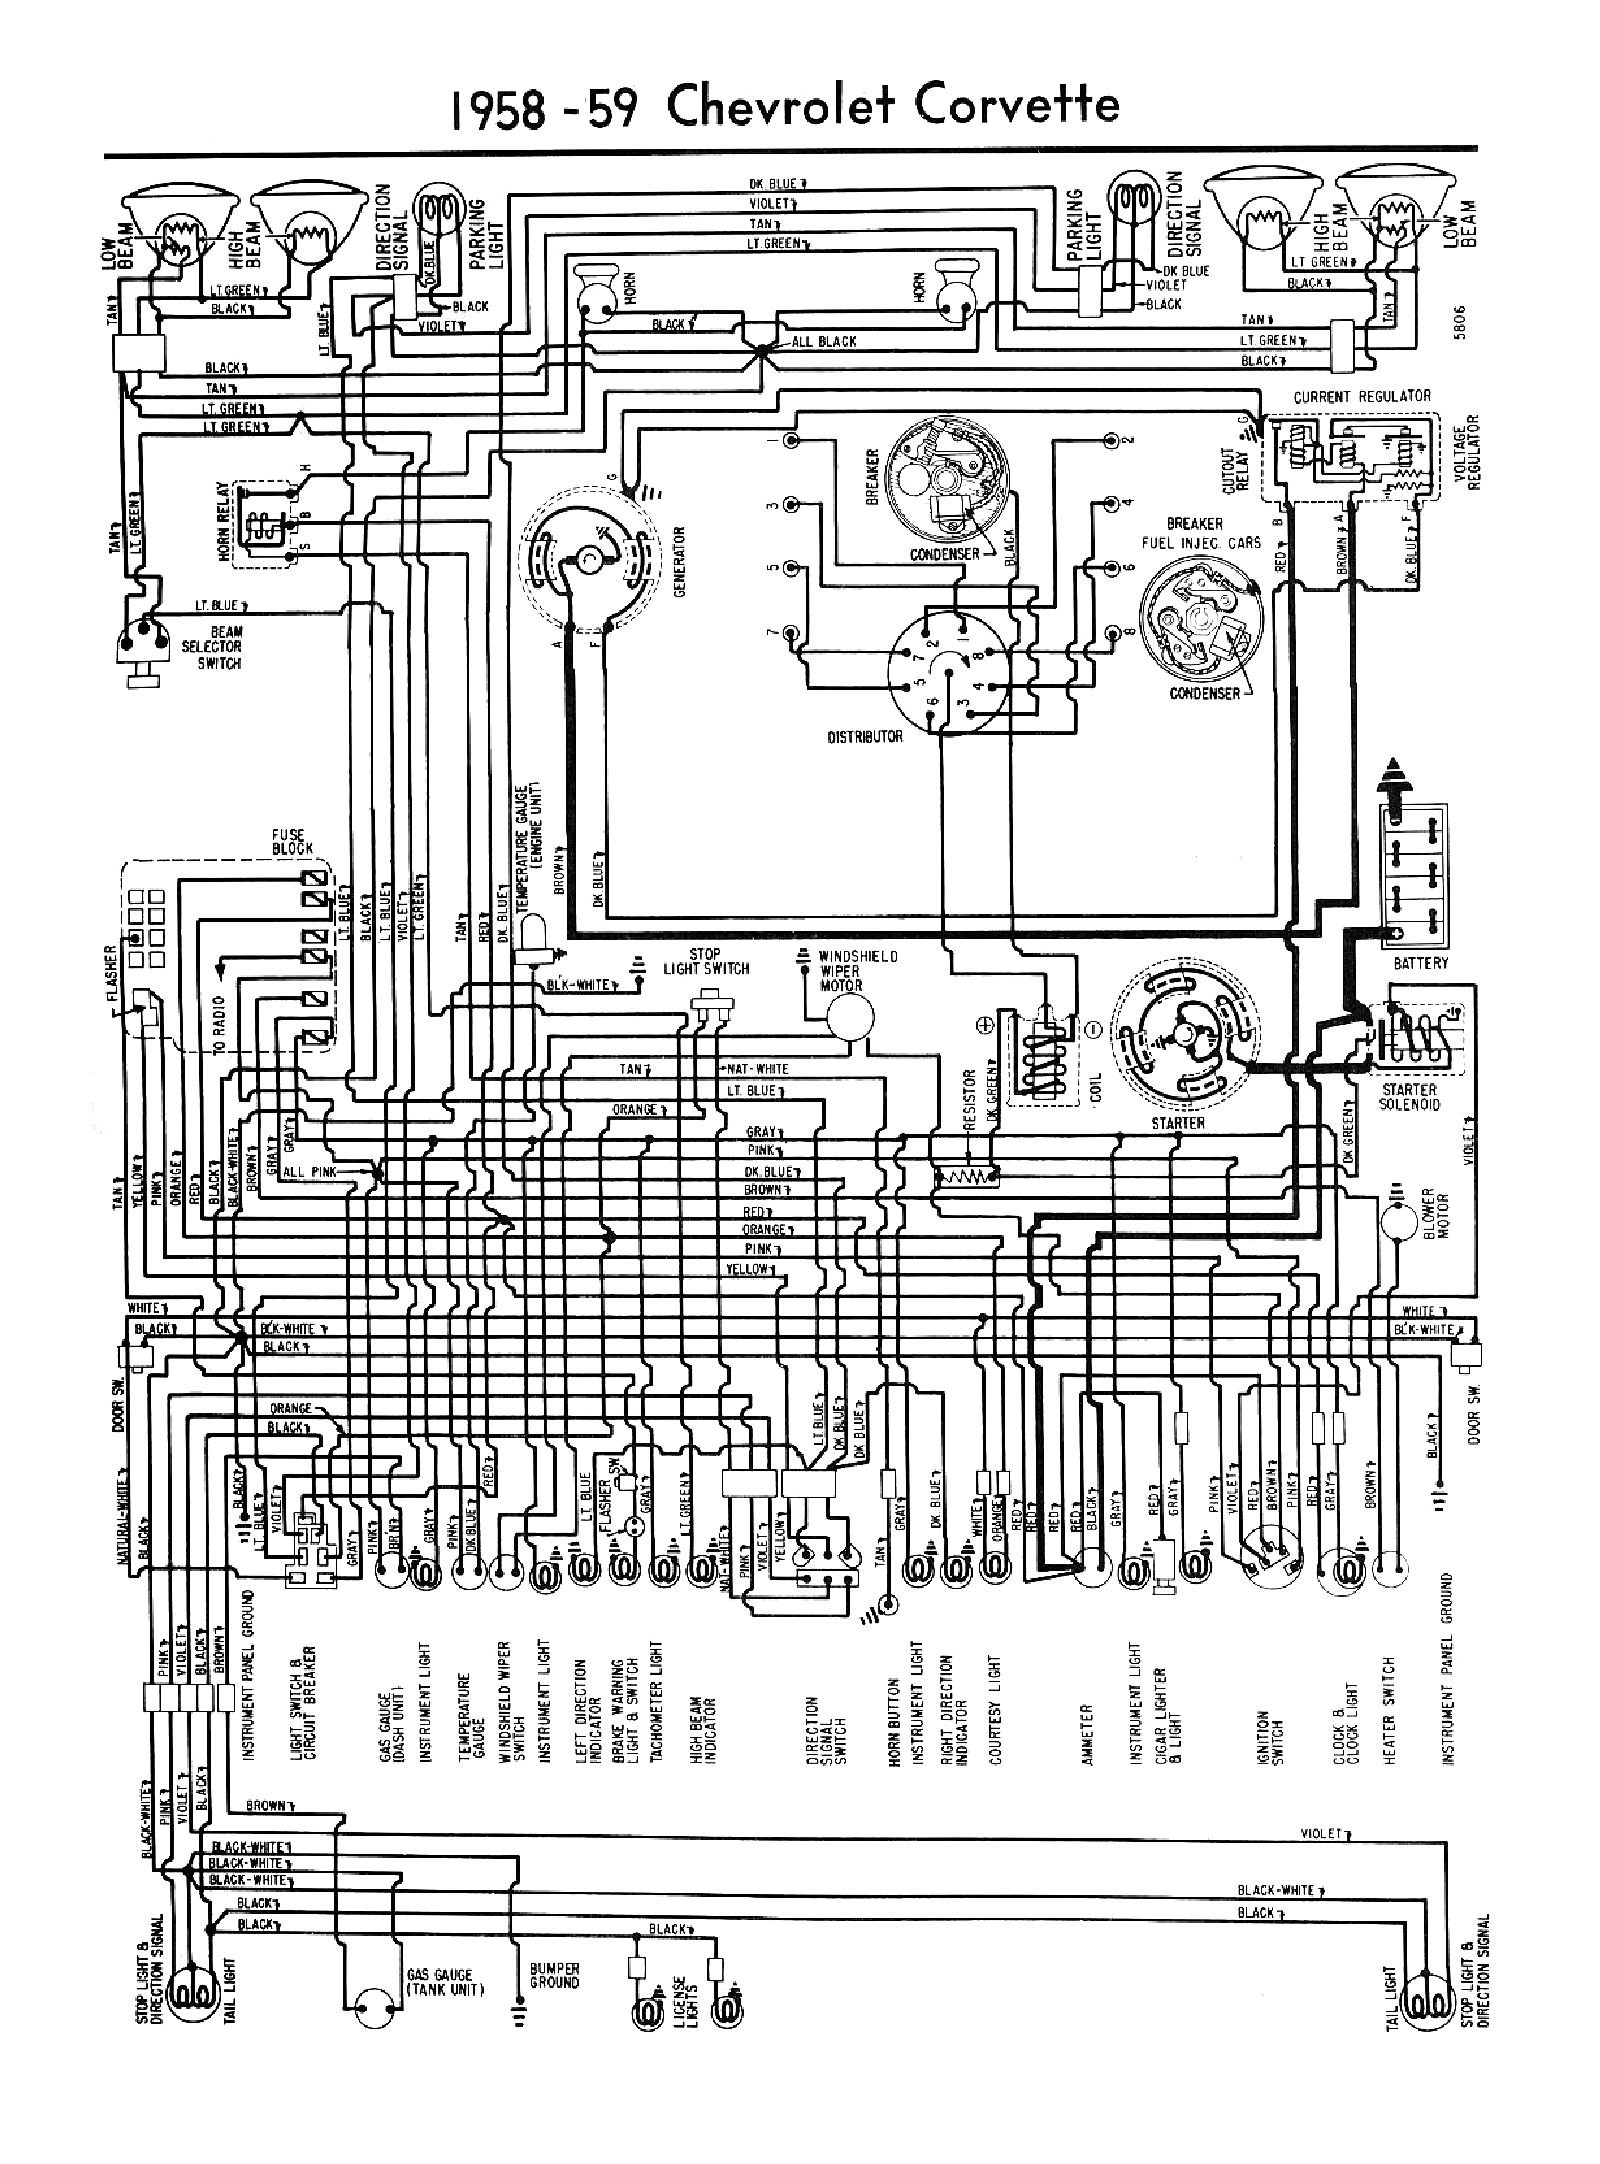 chevy truck body parts diagram chevy wiring diagrams my wiring diagram rh detoxicrecenze com 1970 Chevy Truck Wiring Diagram 1988 Chevy Truck Wiring Diagrams